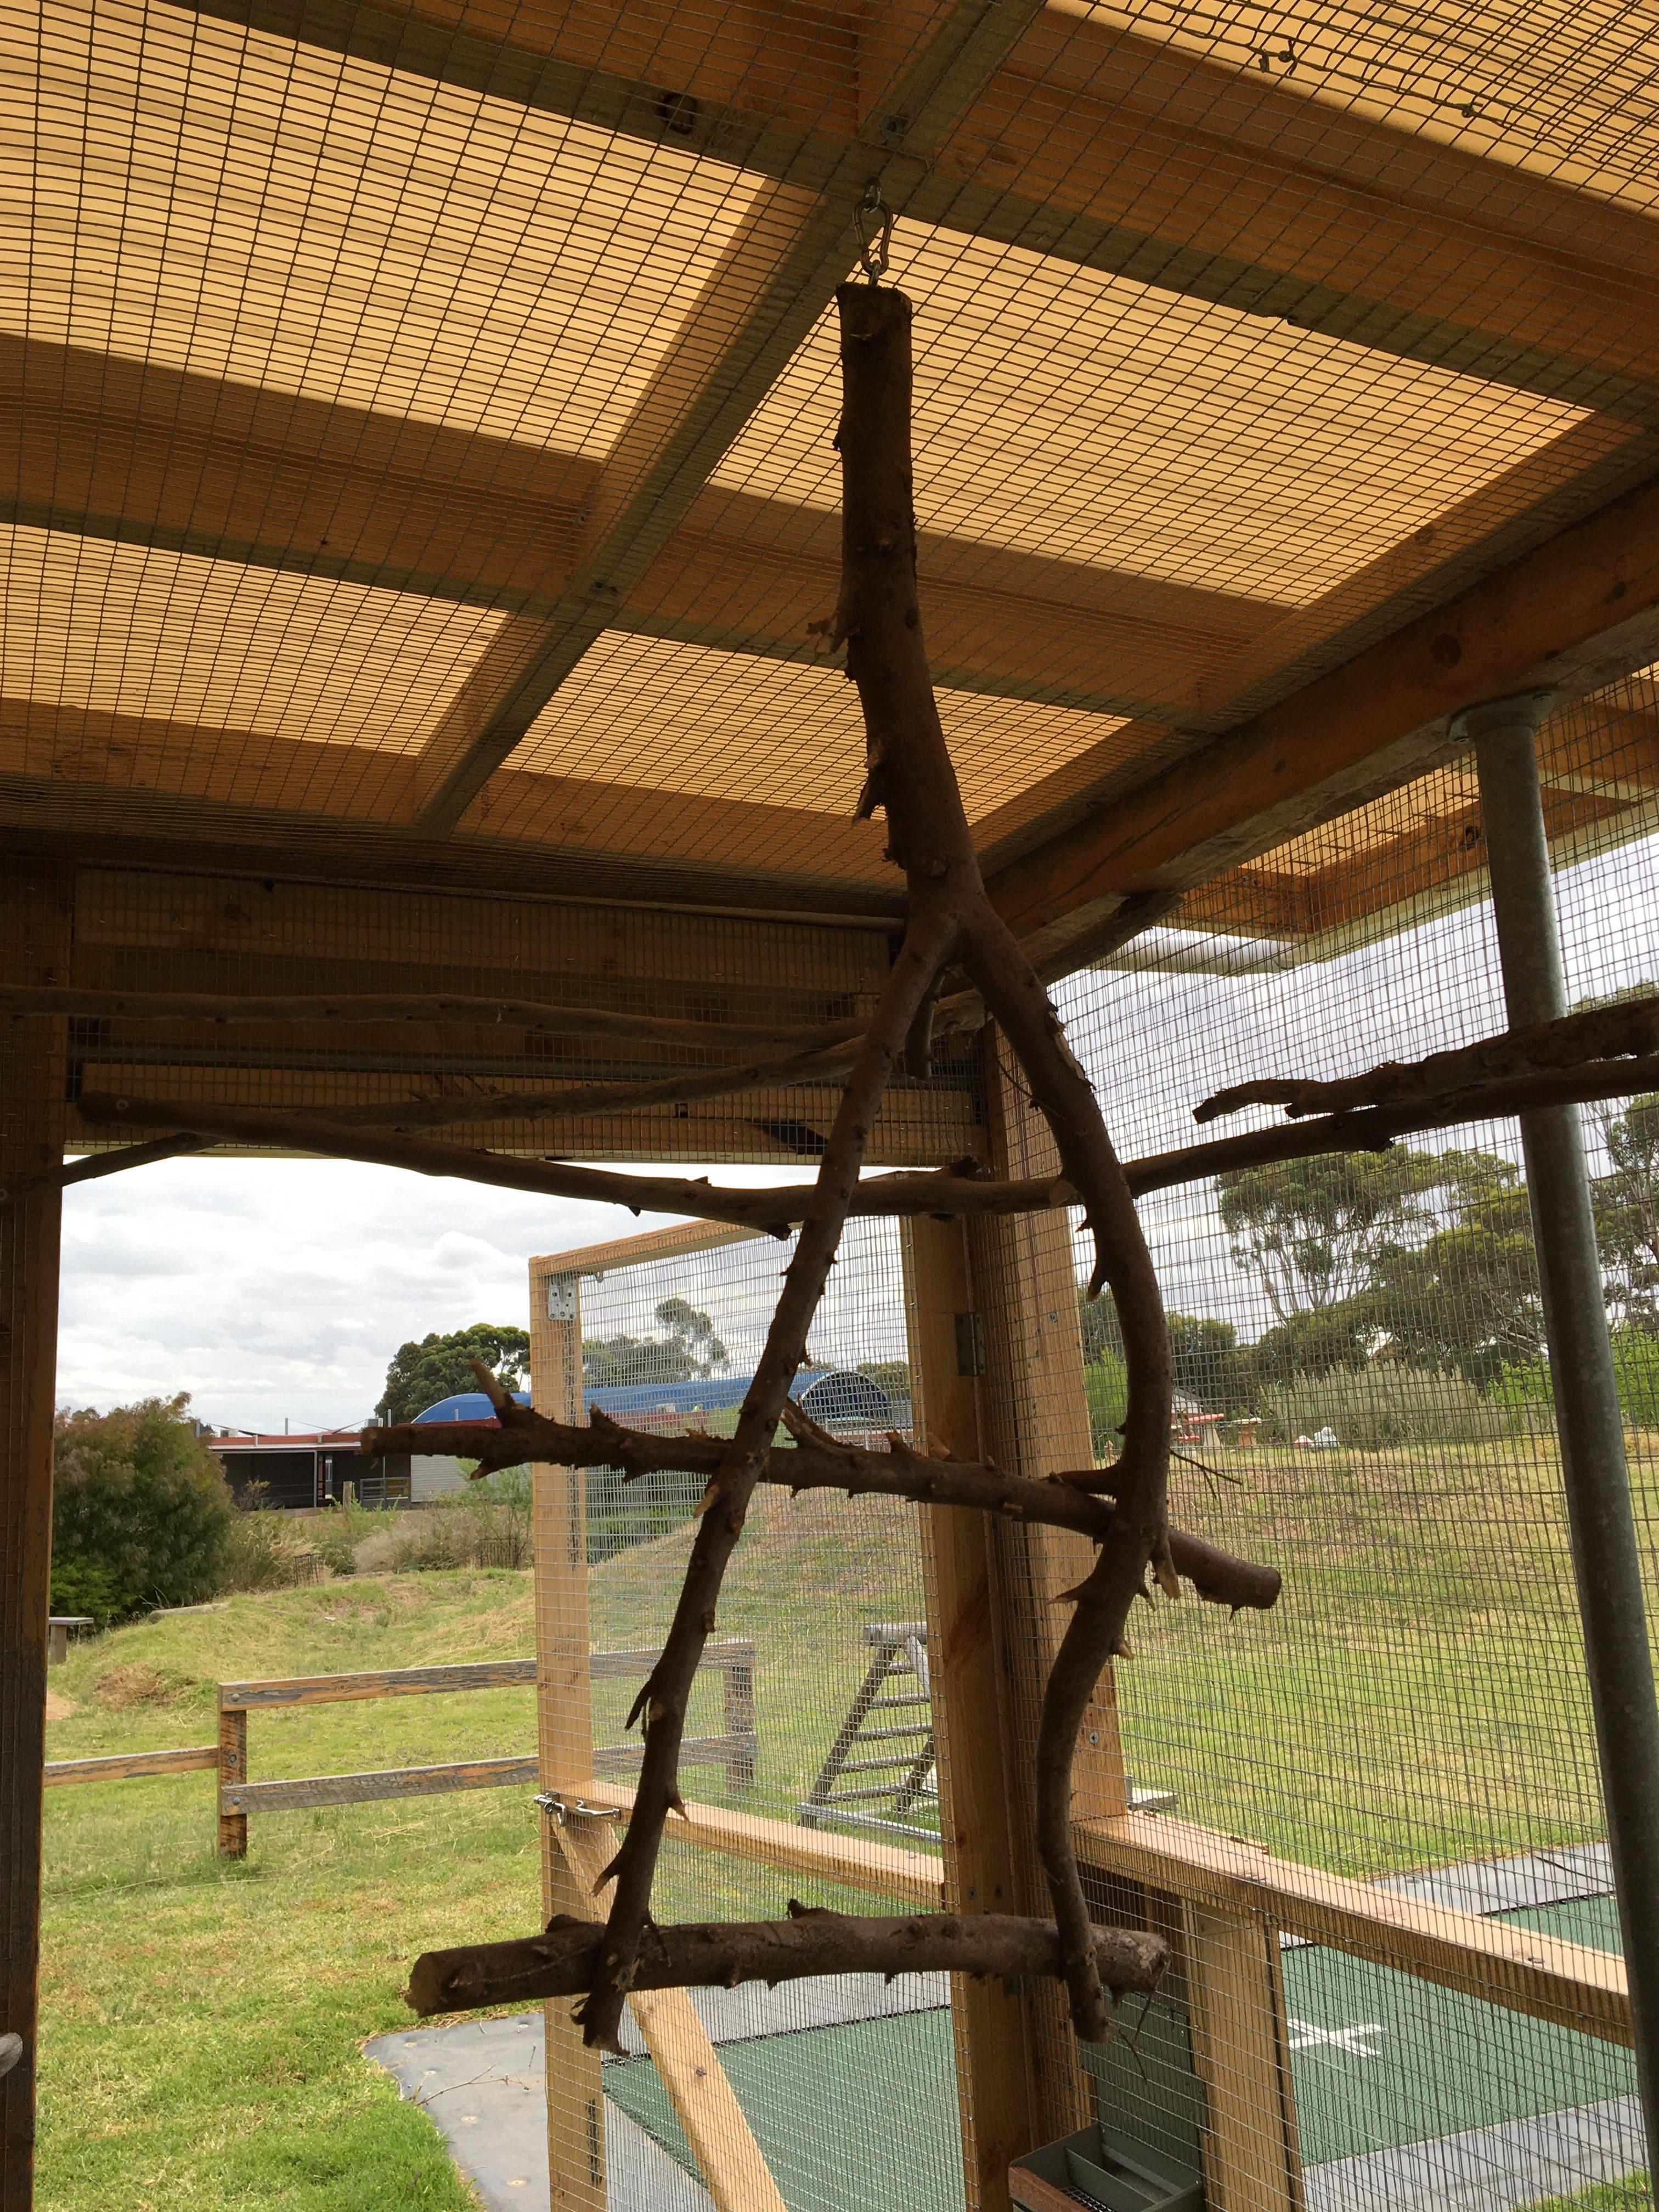 p5 – a-frame swing